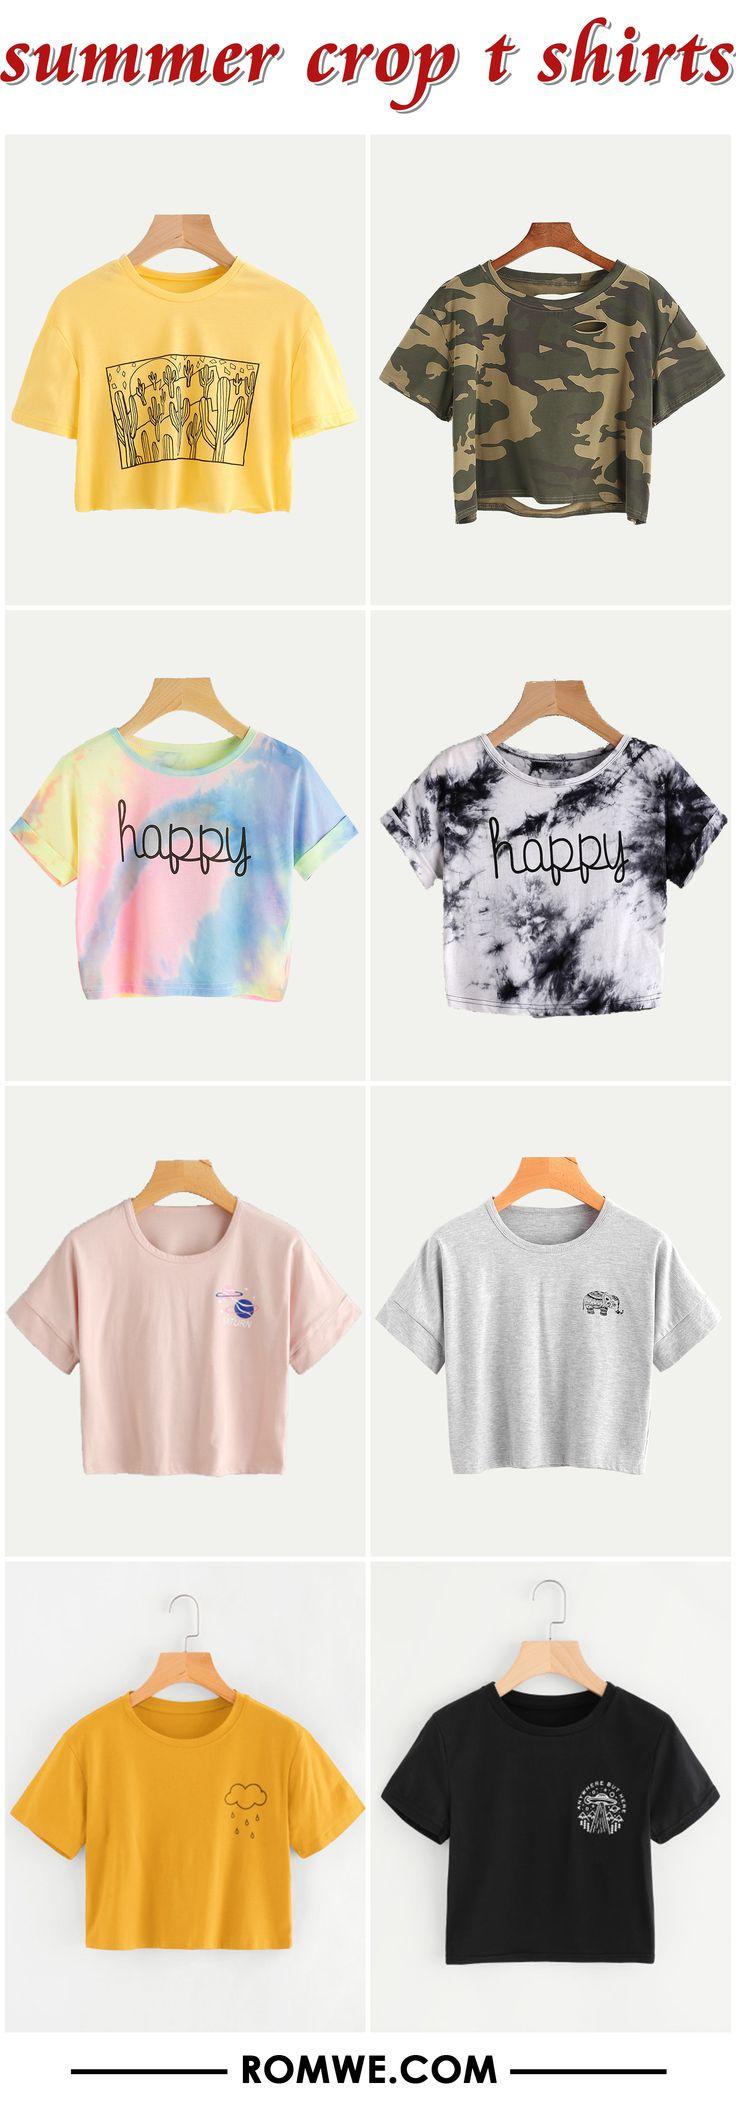 summer crop t shirts 2017 - romwe.com